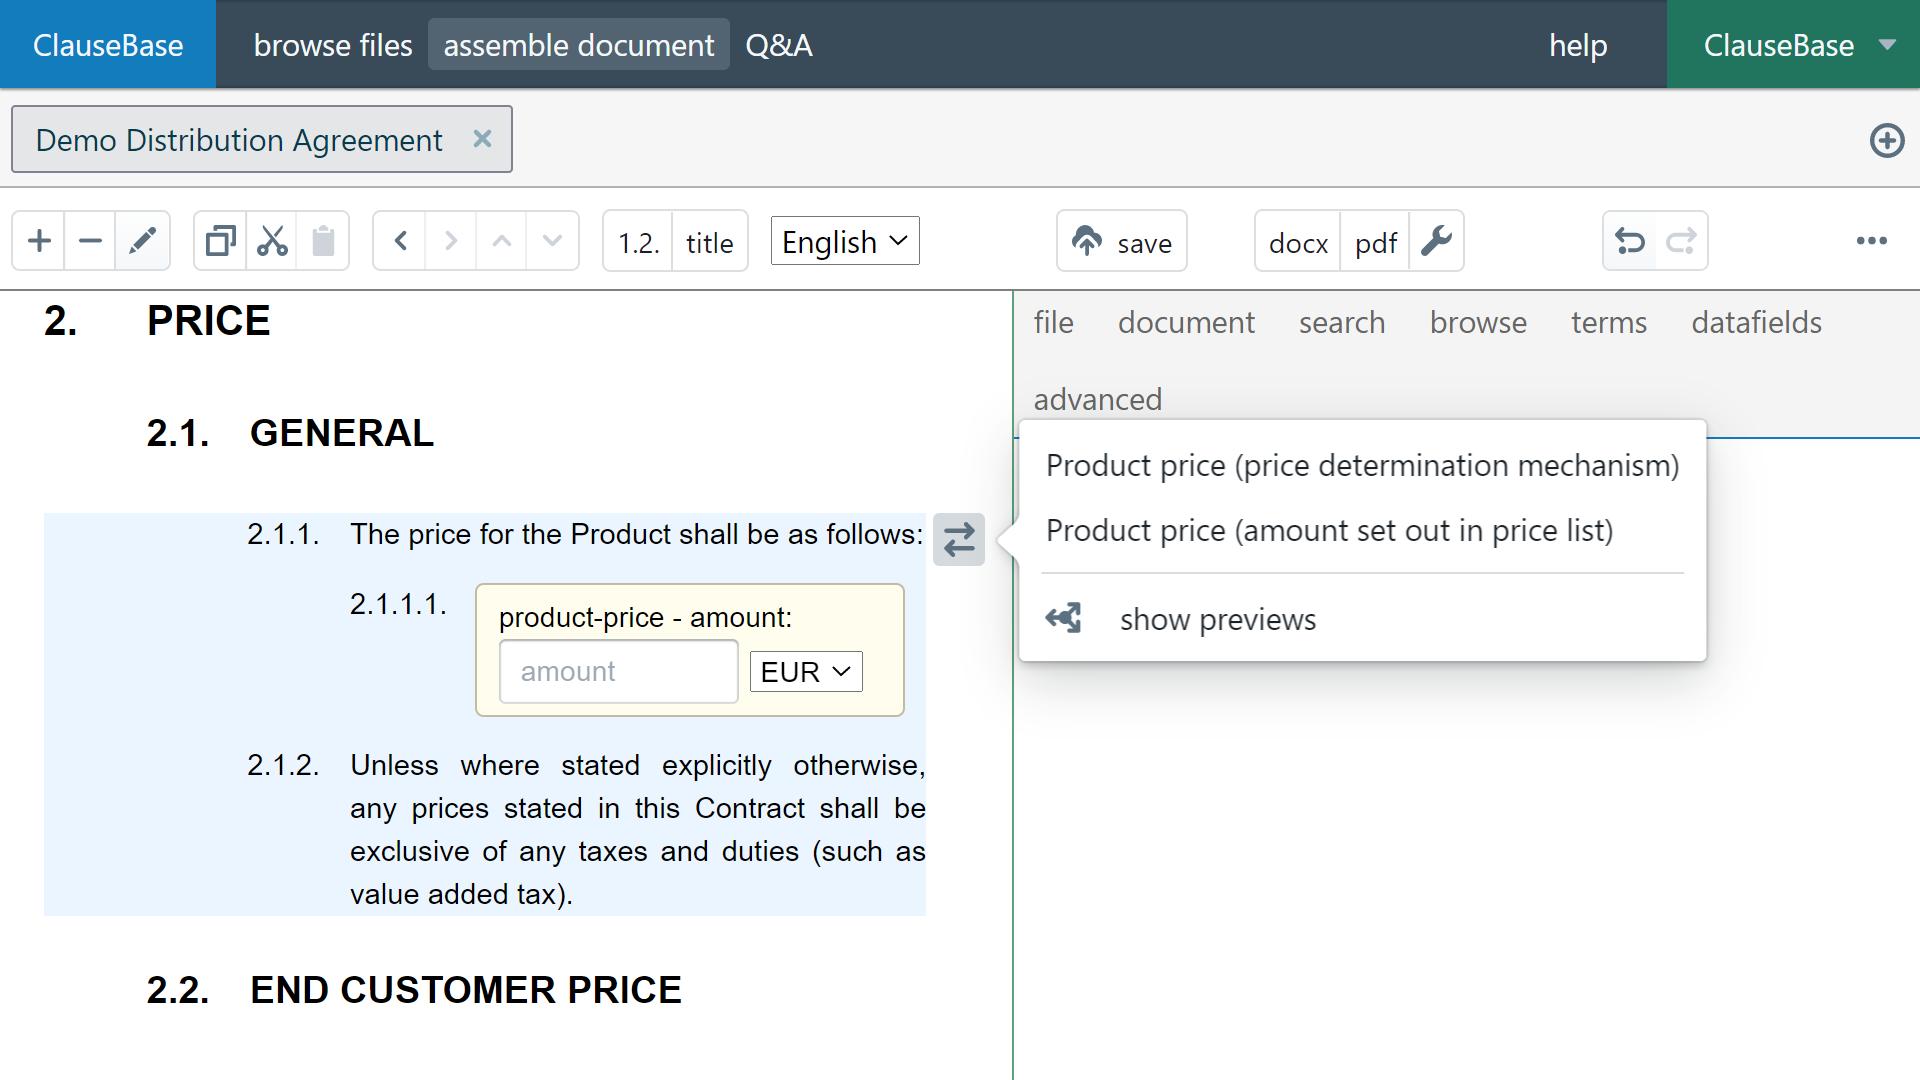 Clausebase-screenshot - demo distribution agreement